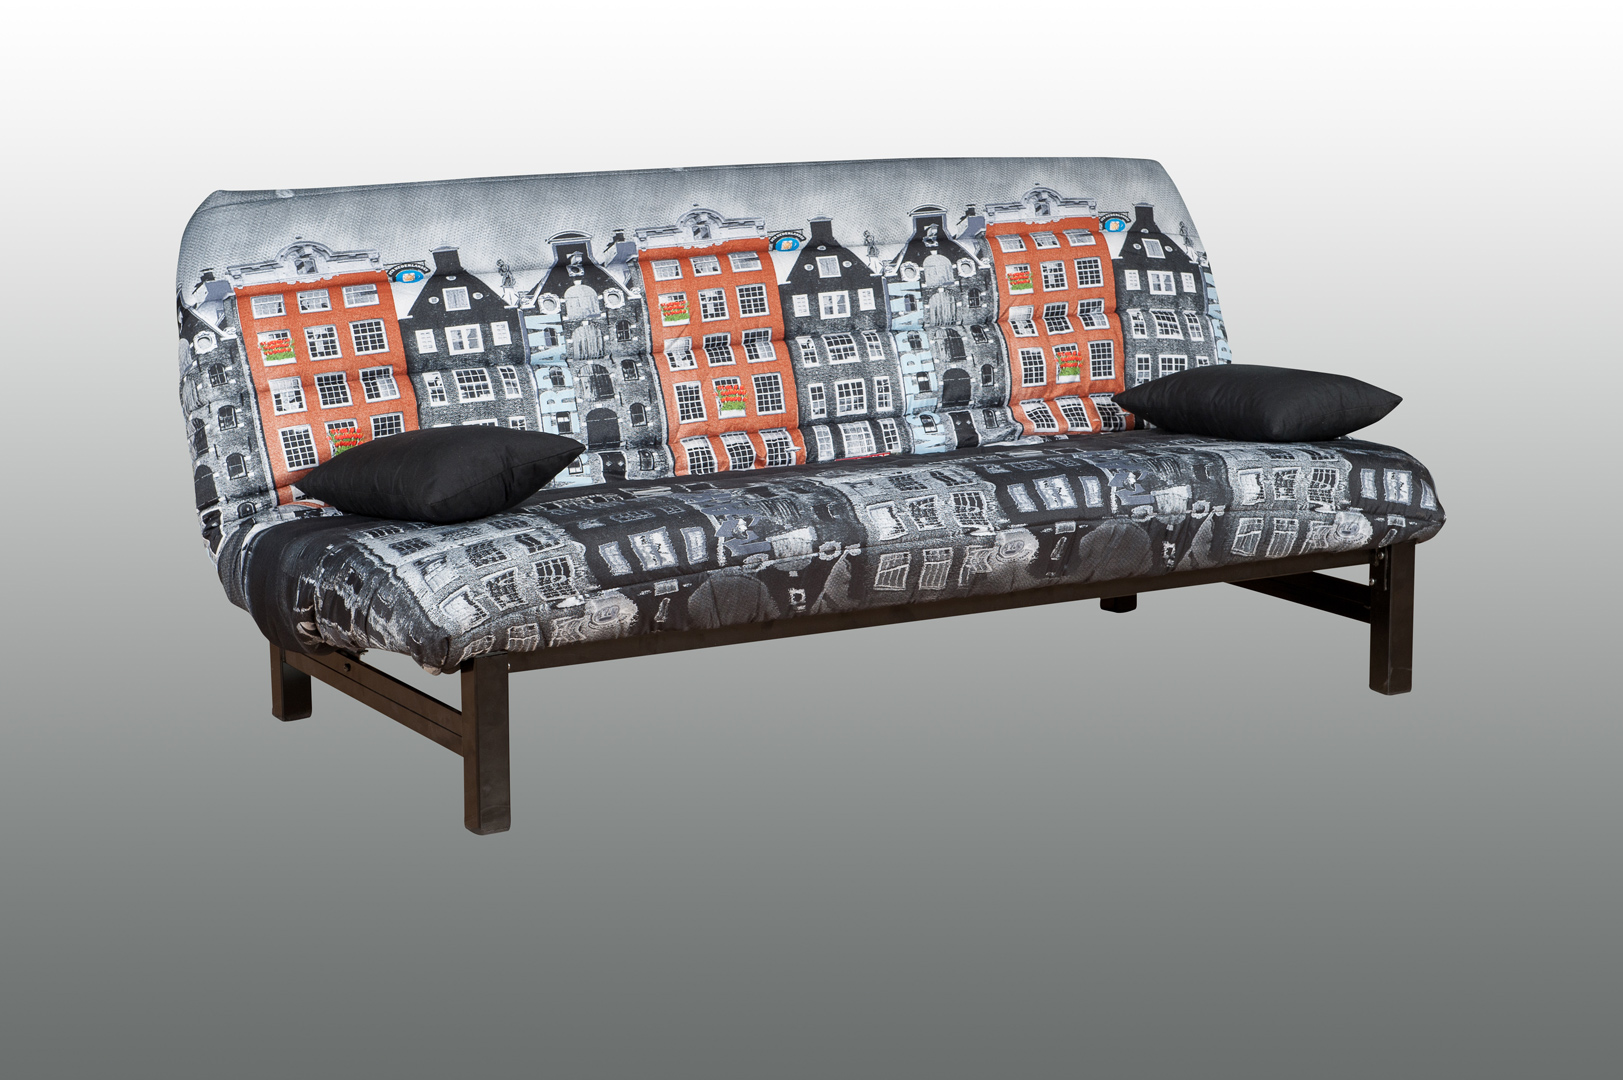 Clic-clac en tissu imprimé Amsterdam Courtney